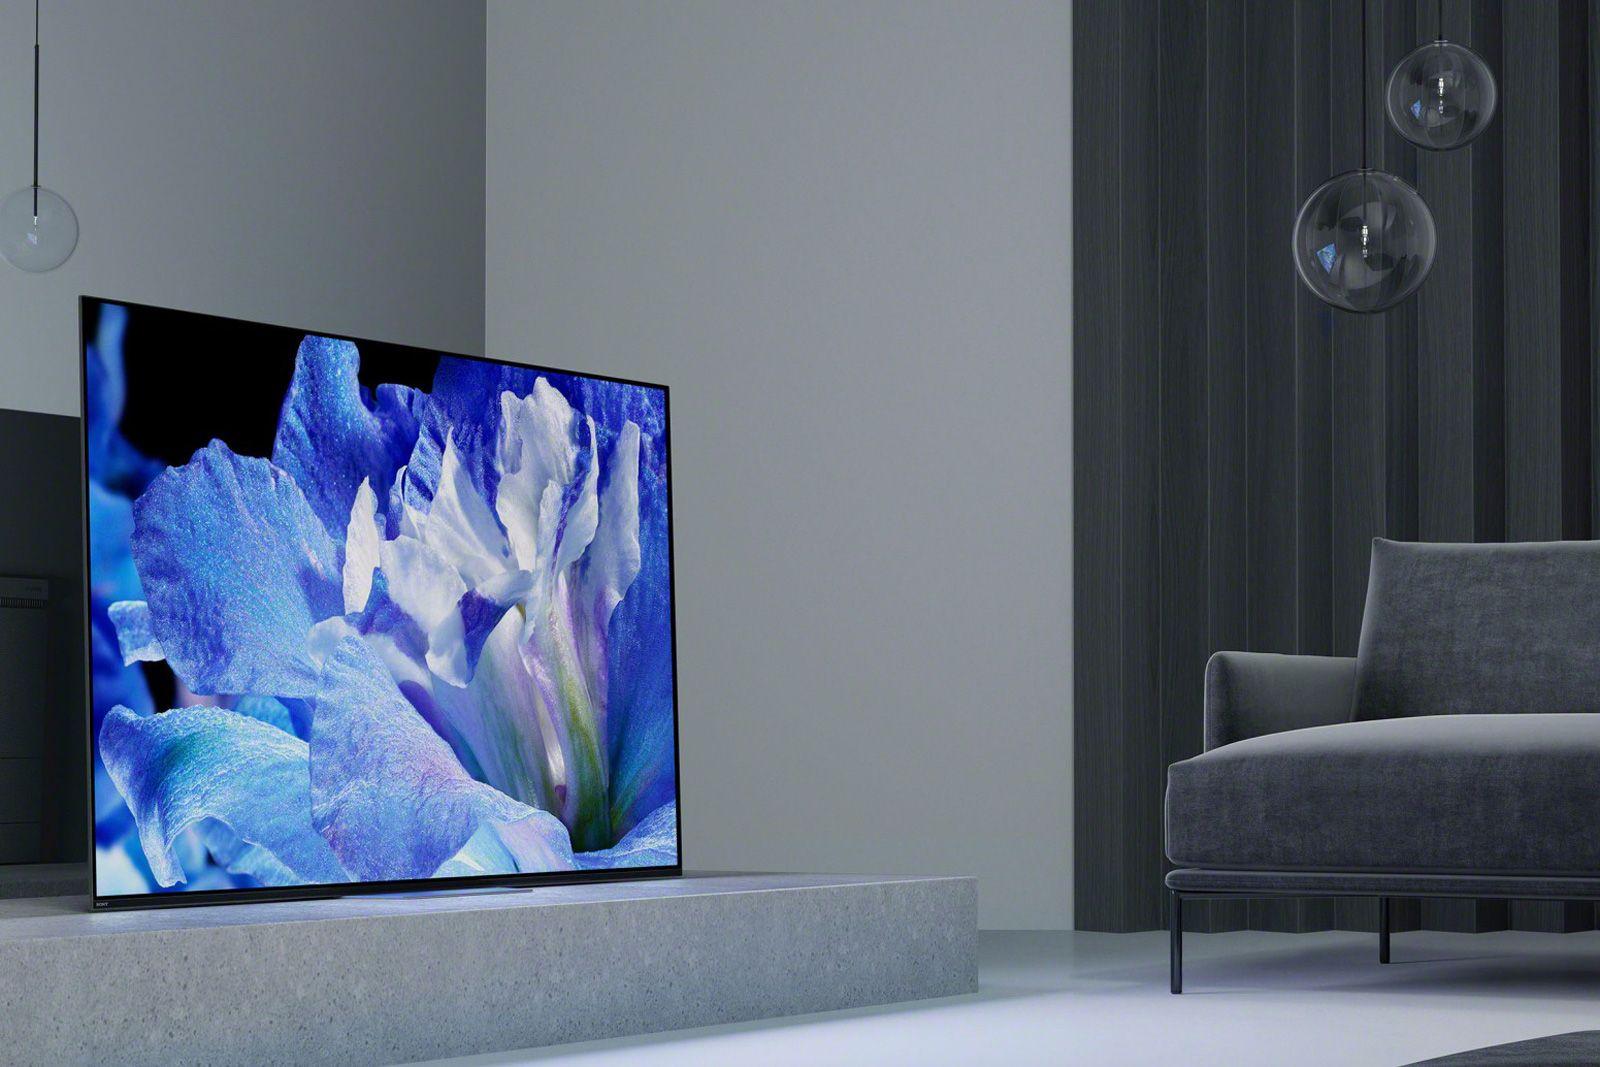 Sony S 2018 Oled Tv Starts At 2 800 Tvs Sony Smart Tv